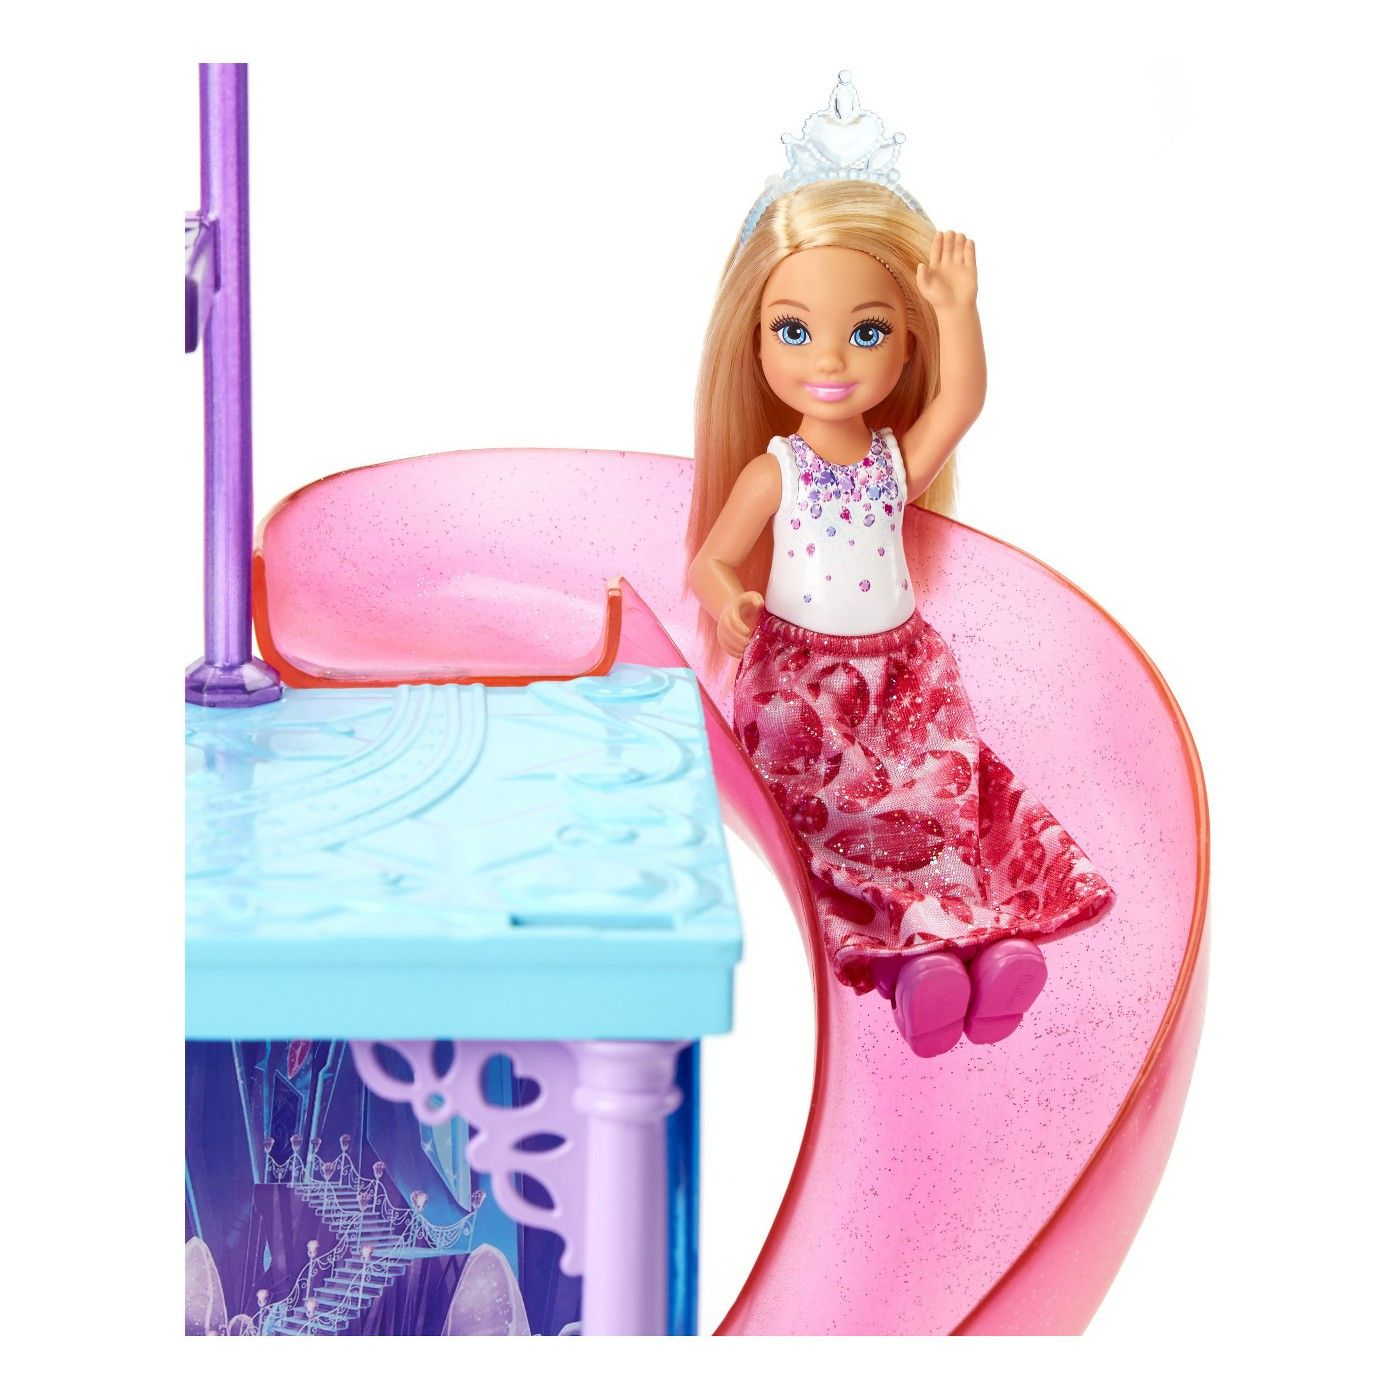 Barbie Dreamtopia Doll and Vanity